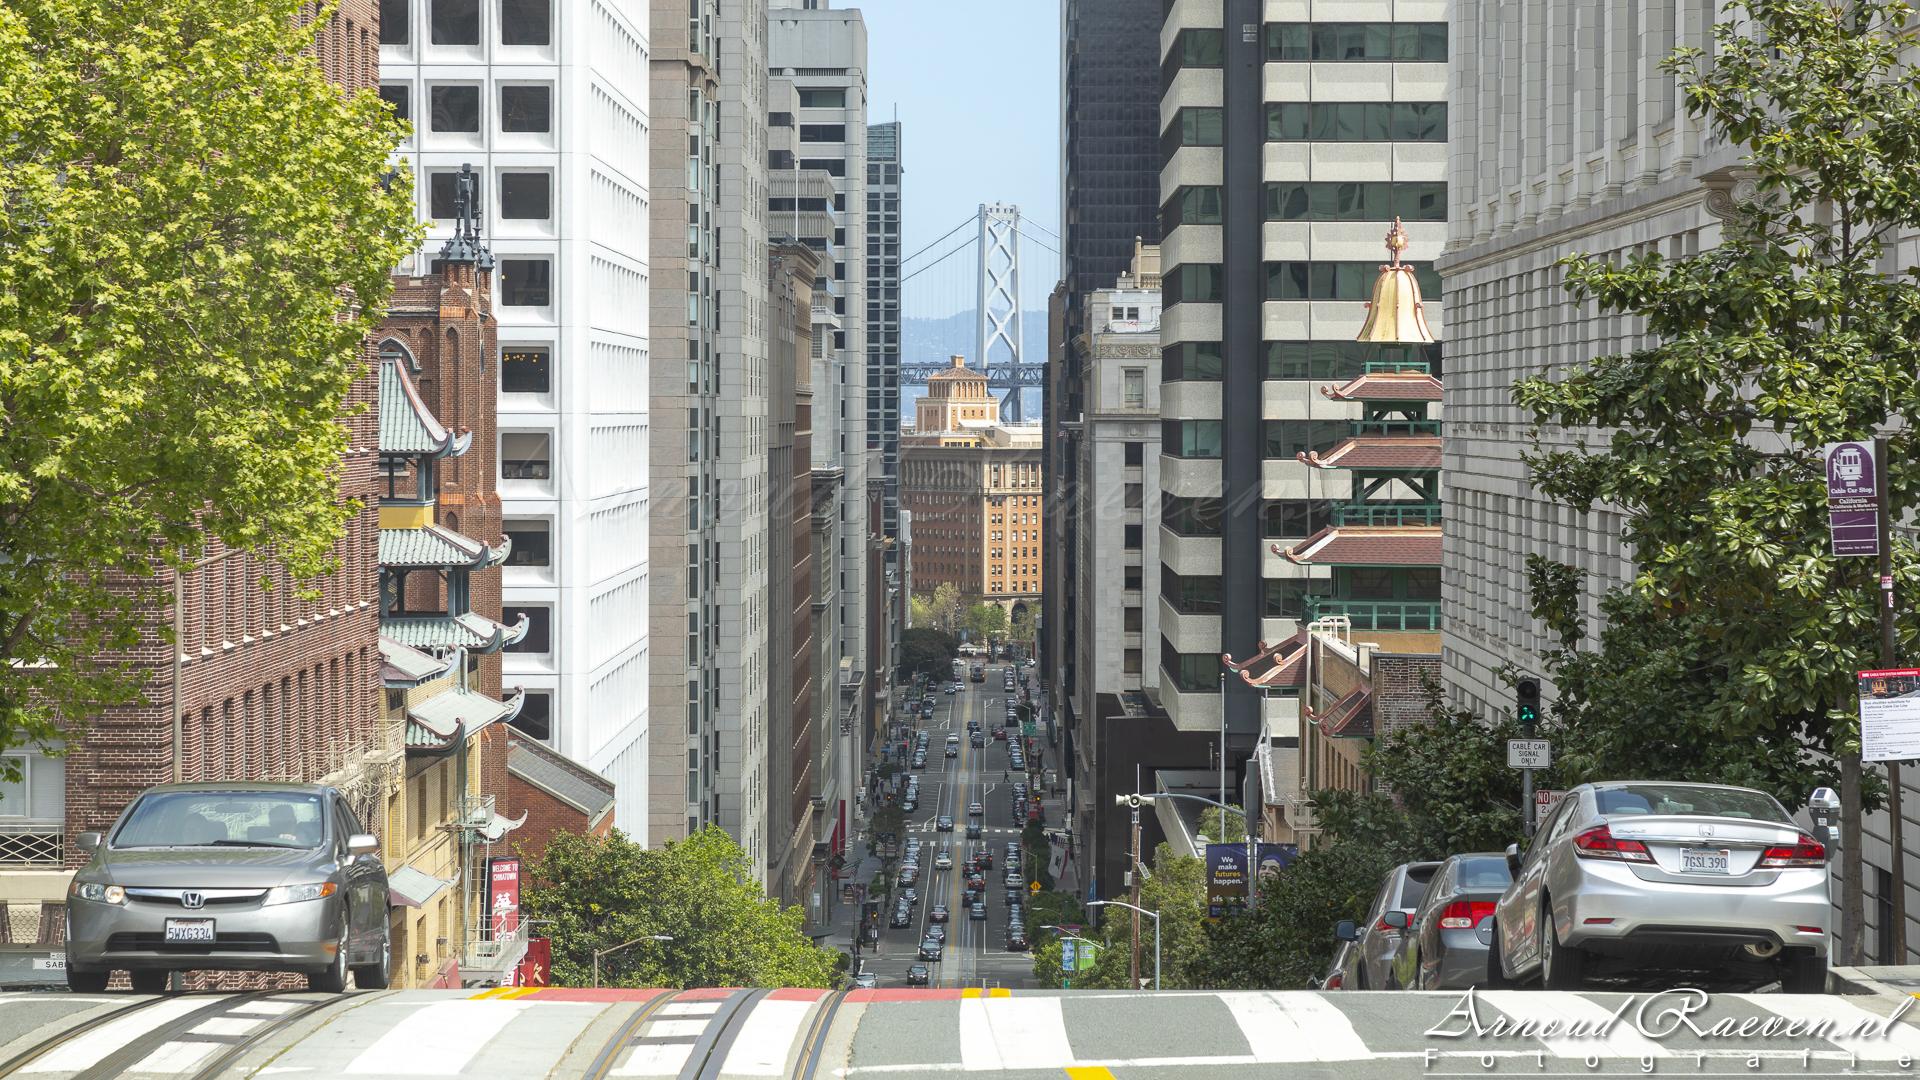 San Franciscio - California Street